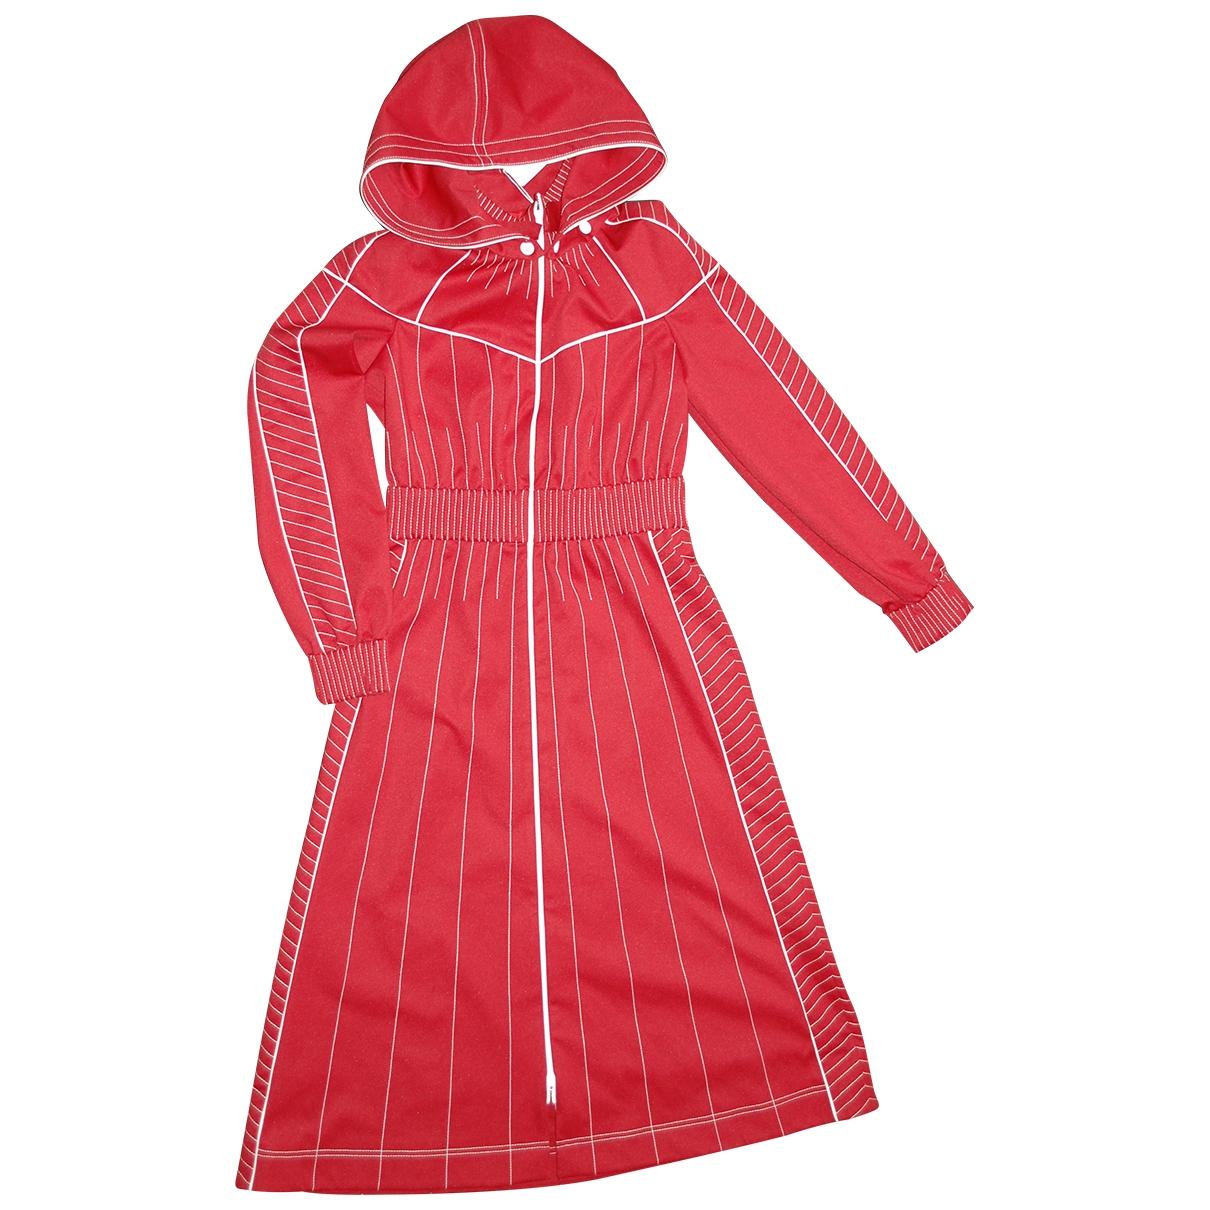 Valentino Garavani \N Red dress for Women 44 IT